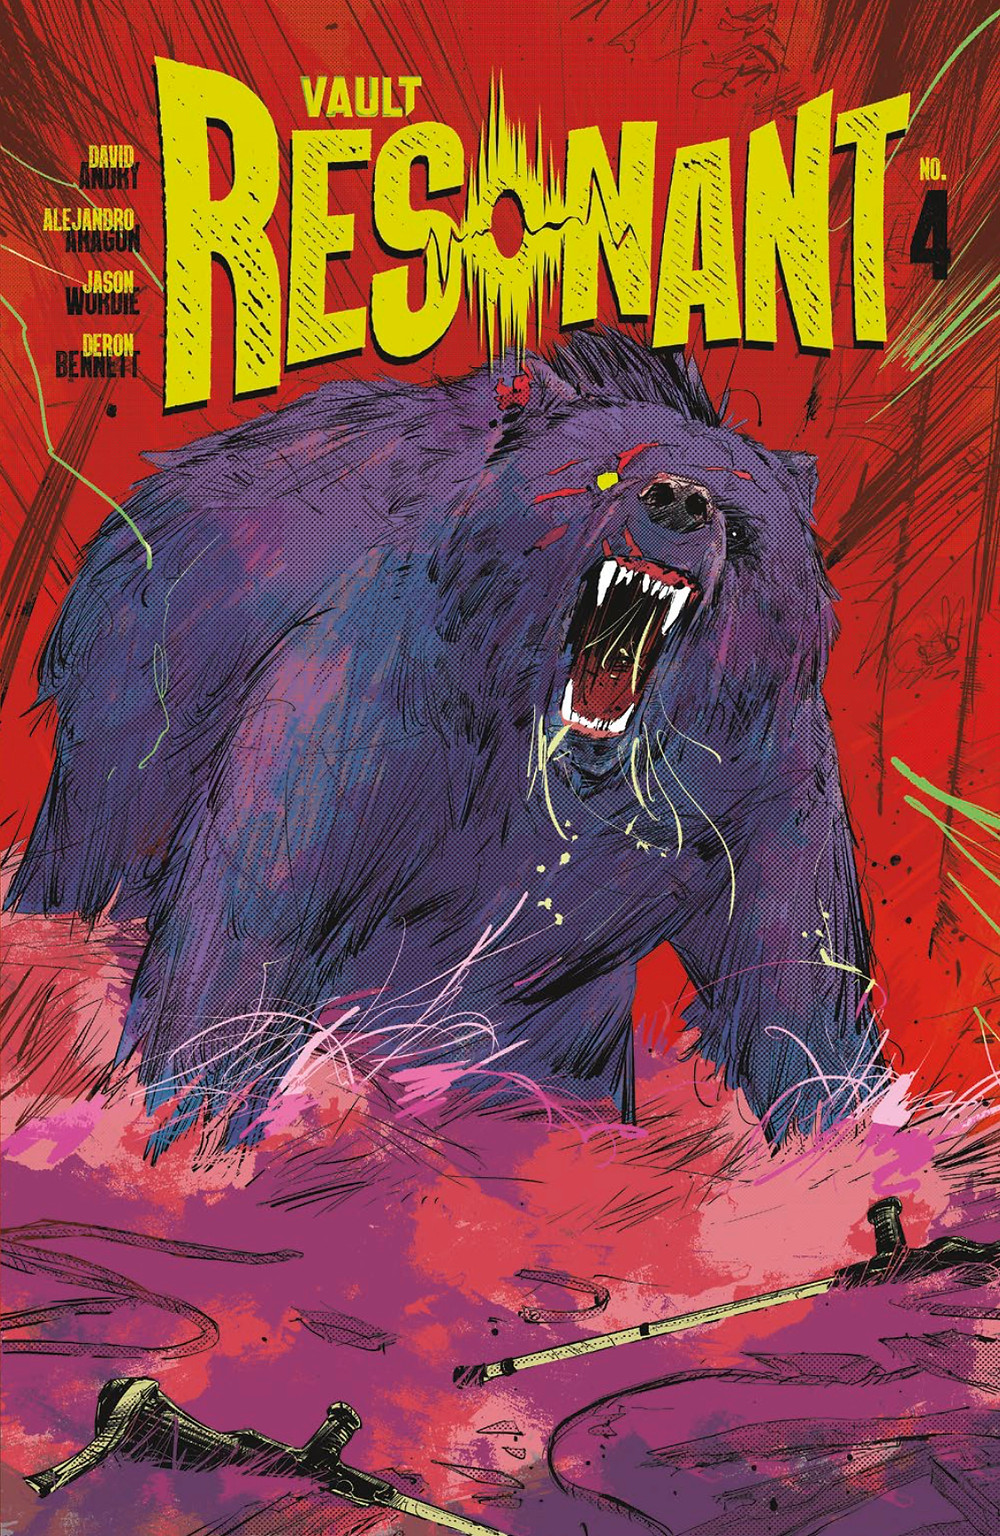 Resonant, issue #4, cover, Vault Comics, Andry/Aragón